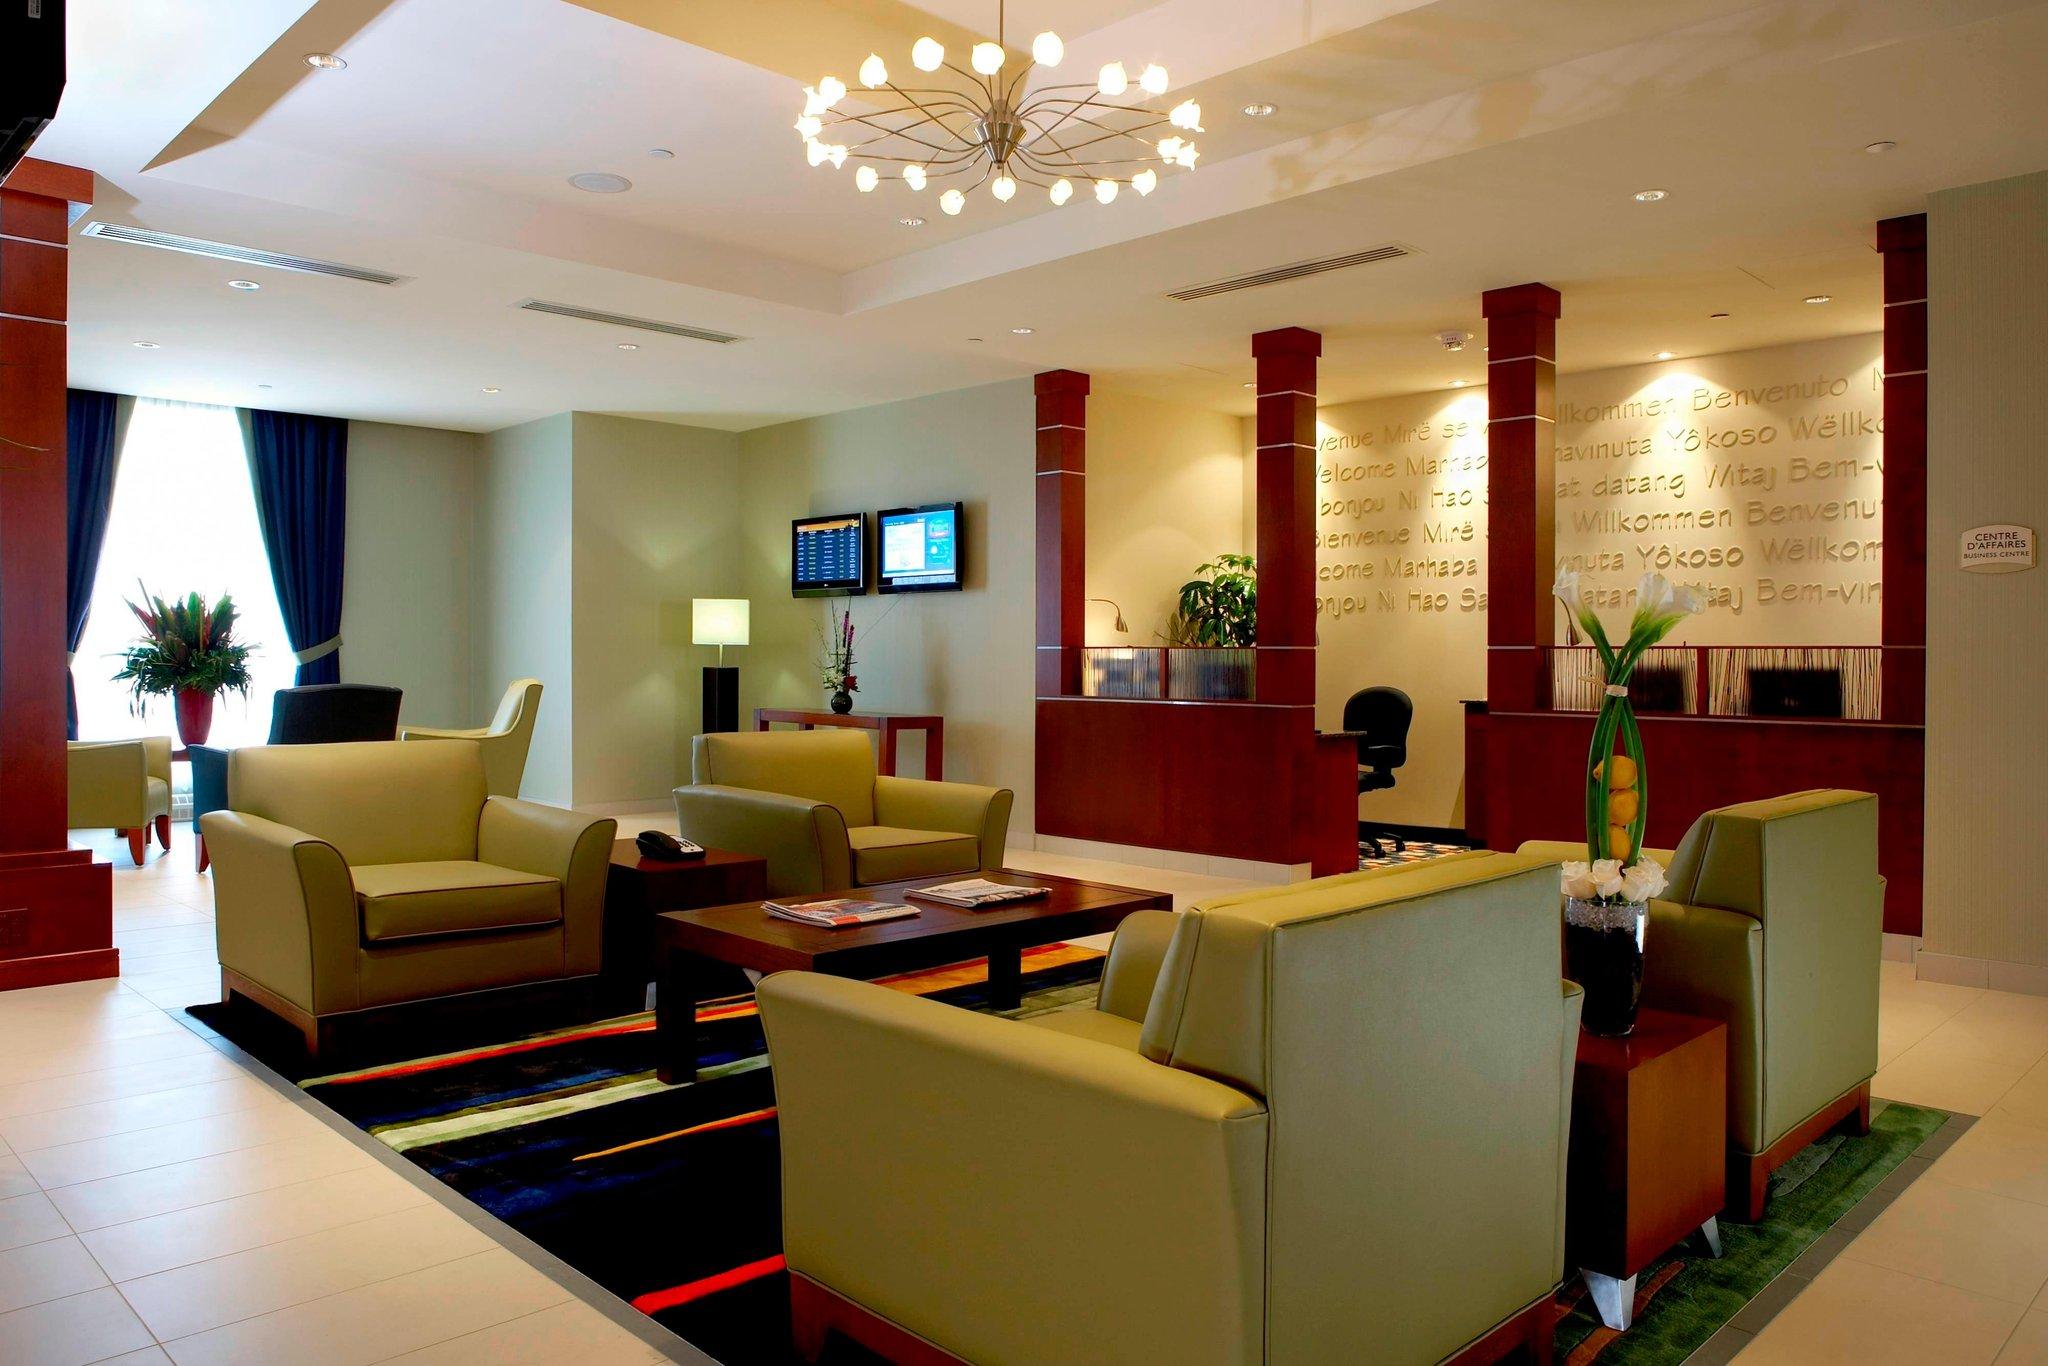 Fairfield Inn & Suites Montreal Airport